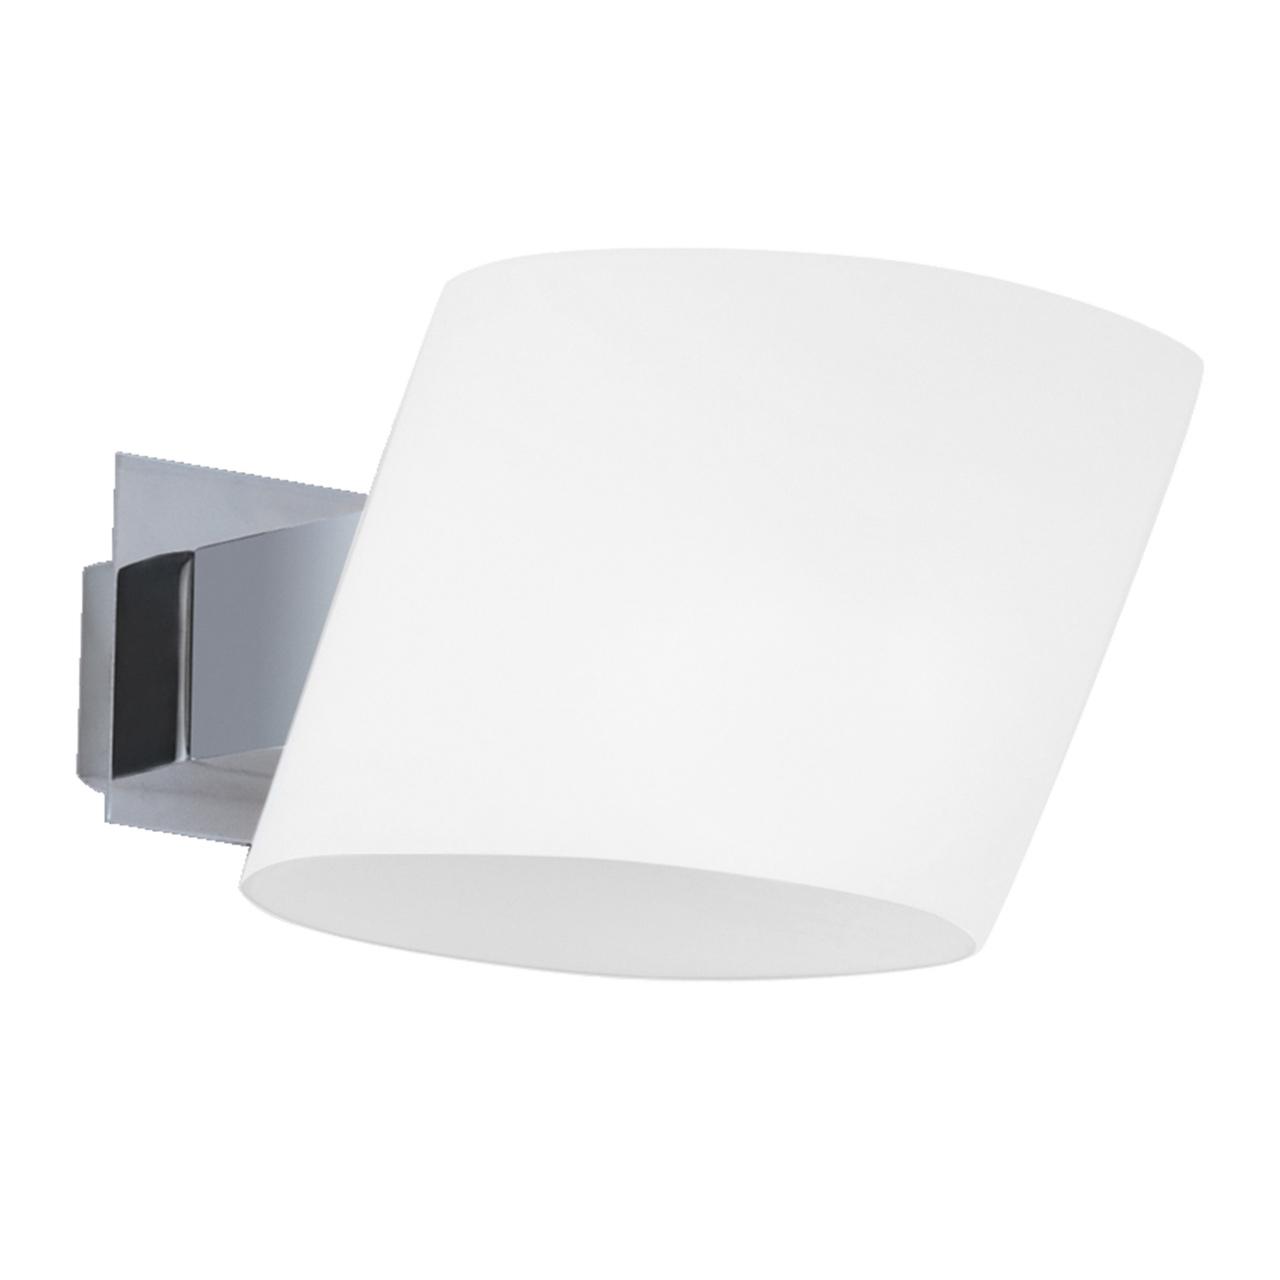 Светильник настенный Dissimo 1х40W G9 хром / белый Lightstar 803610